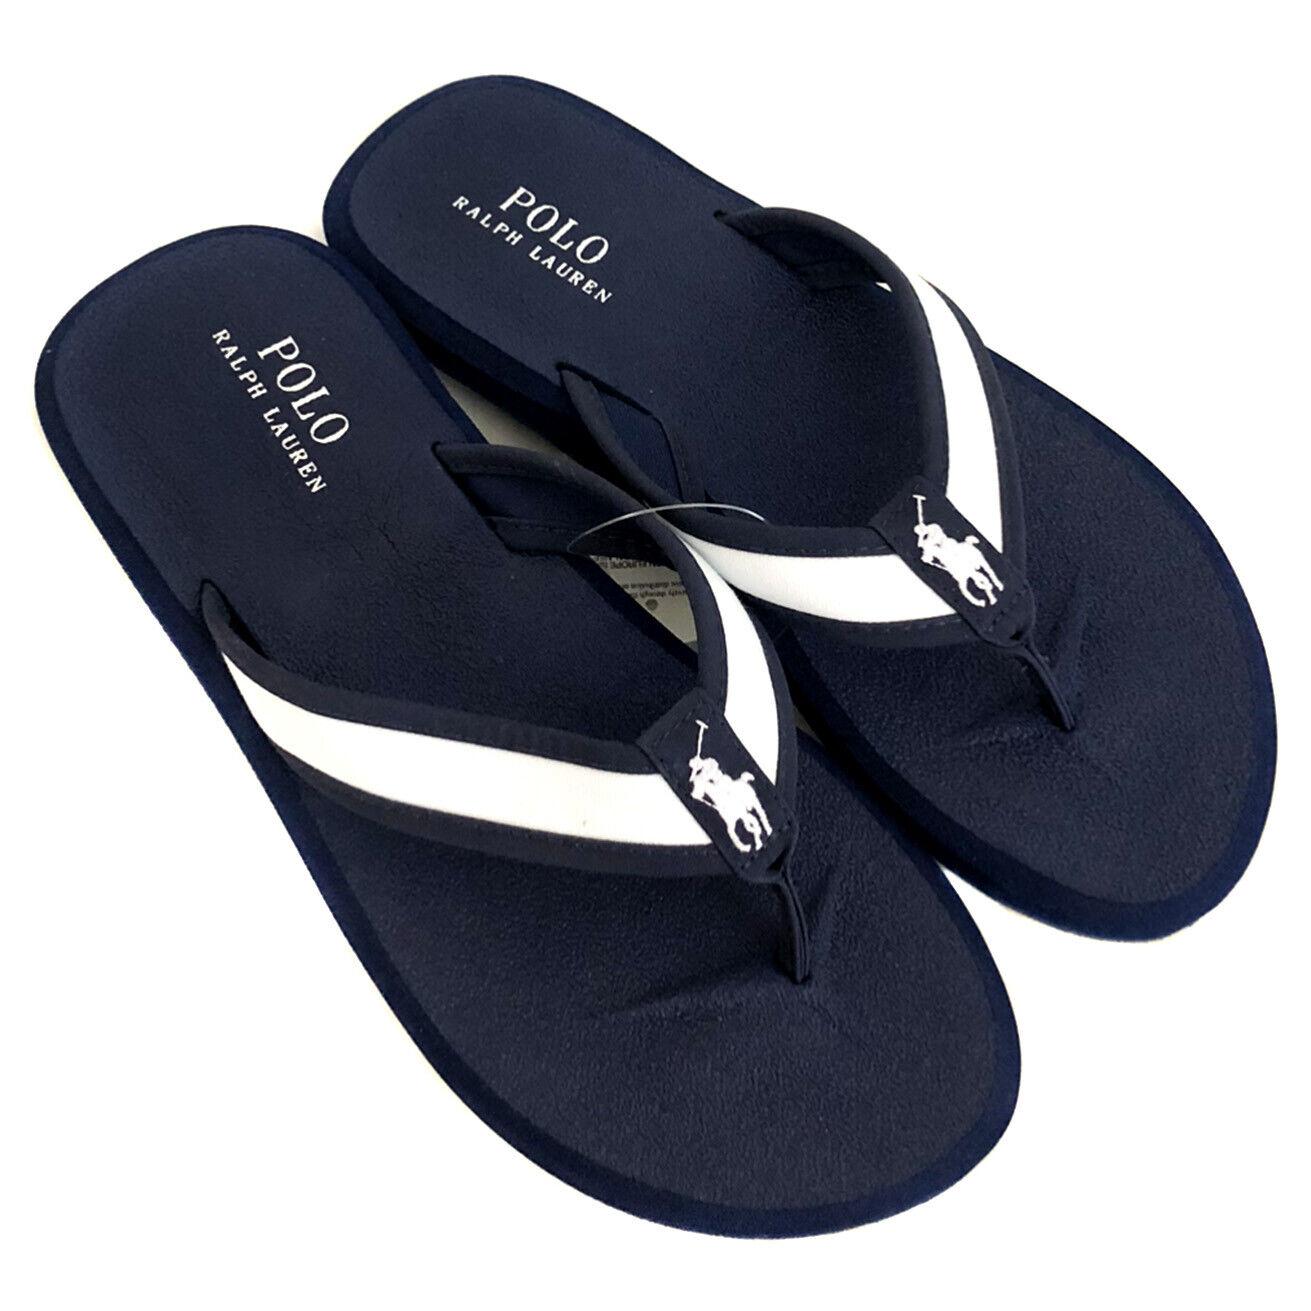 New RALPH LAUREN Navy Flip Flops Slides Sandals Mens UK 10 (EUR 44)